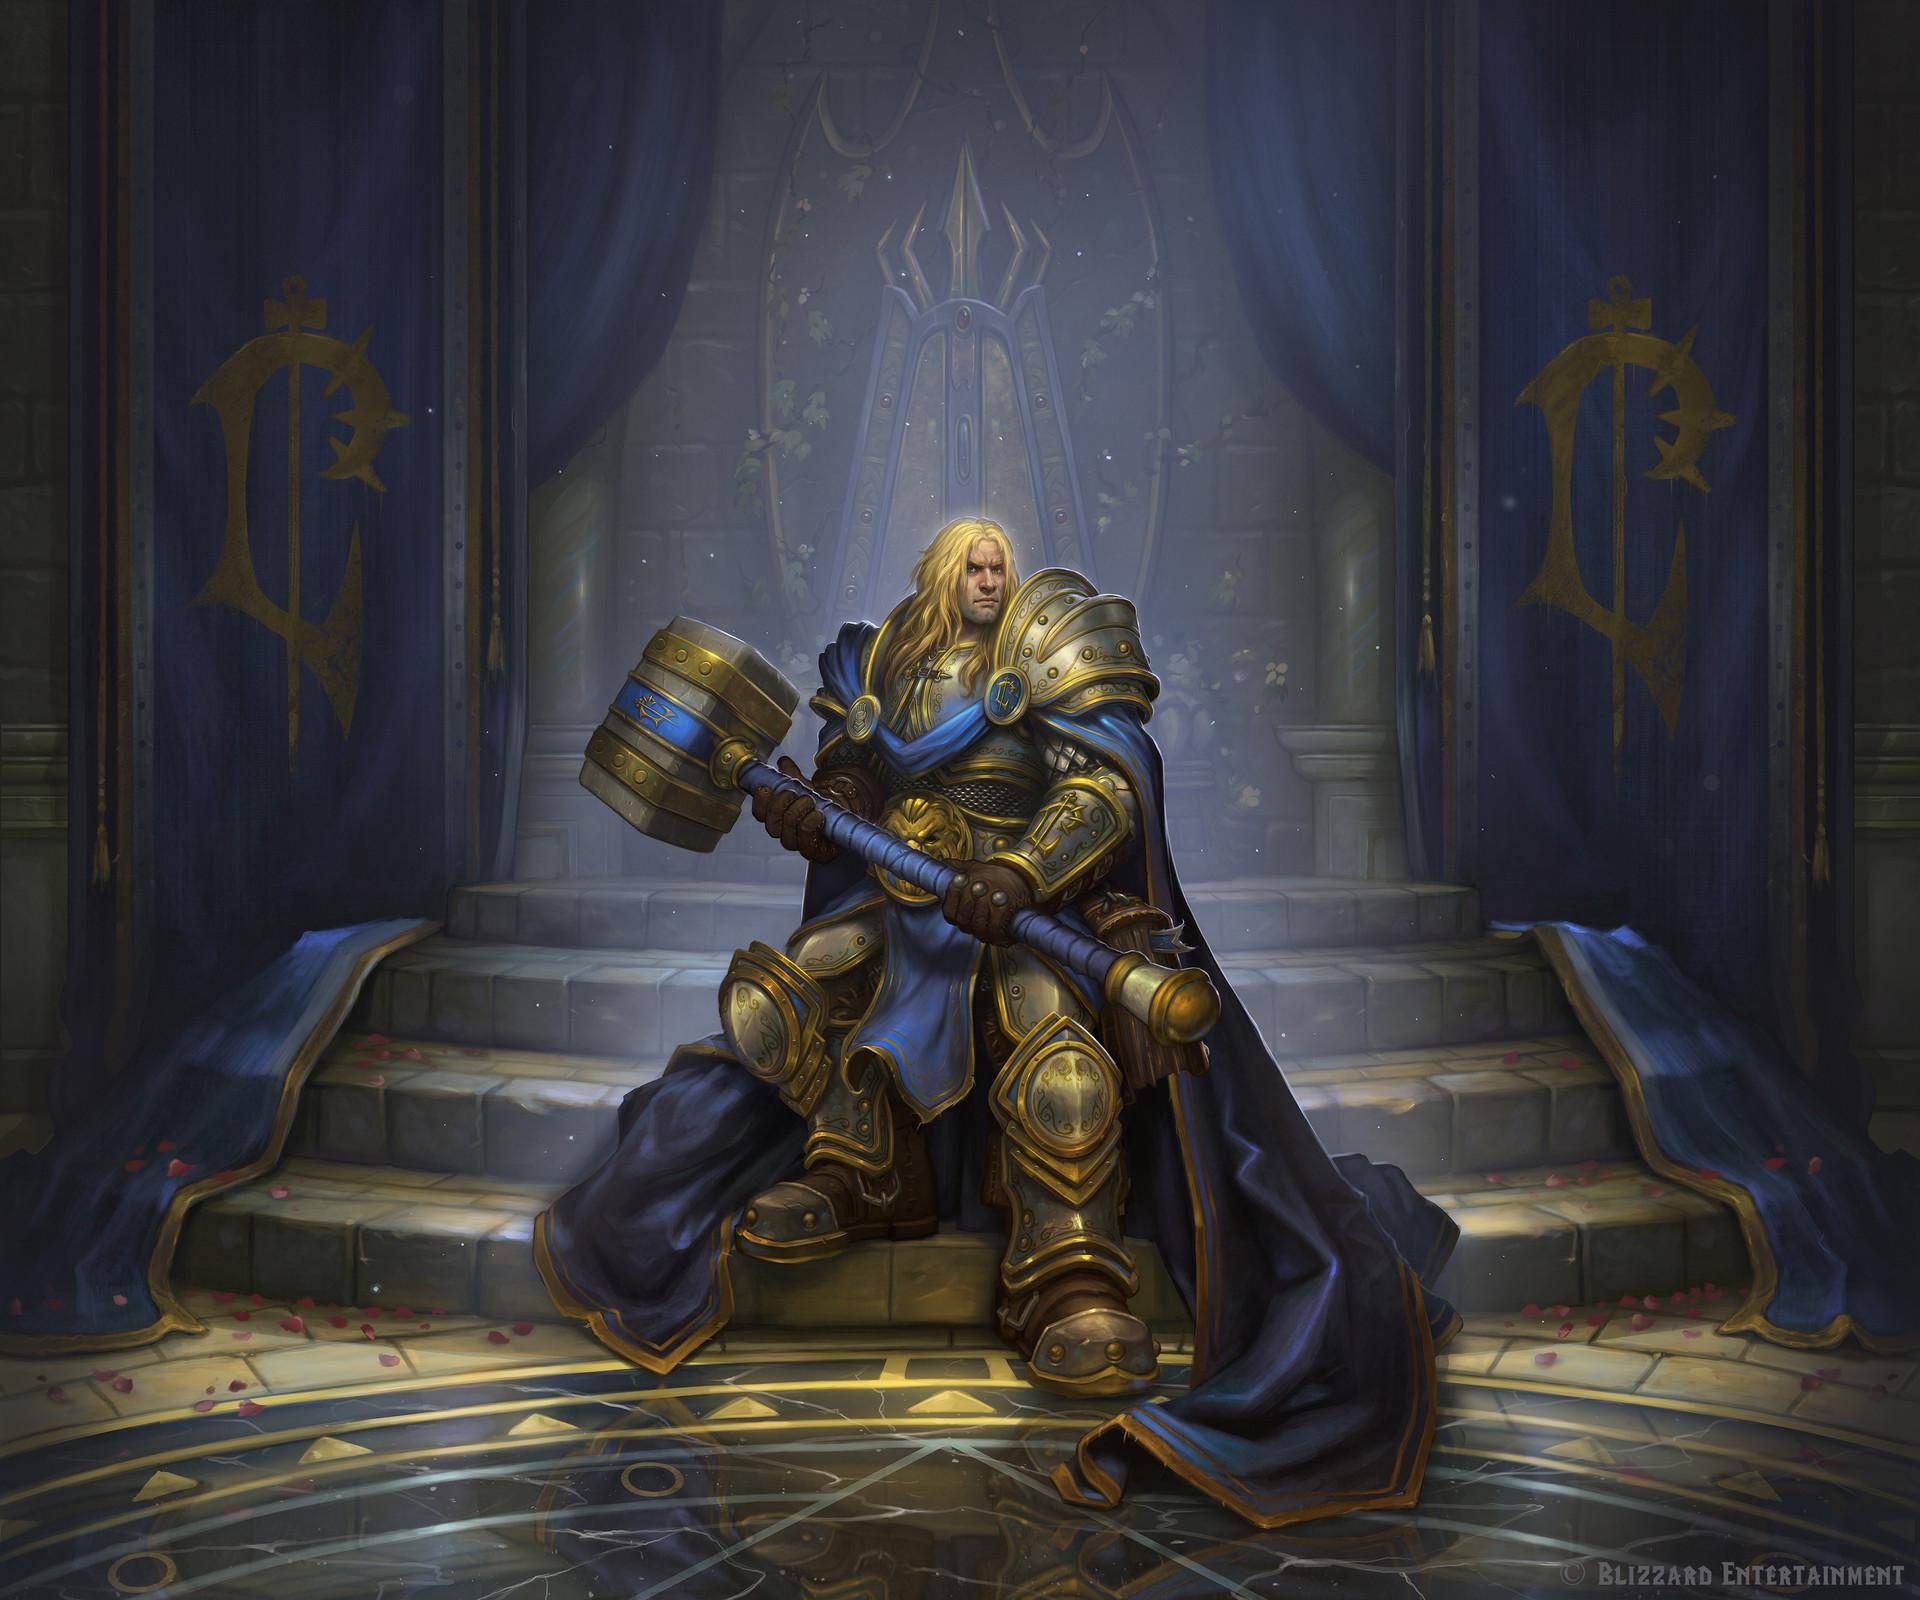 Le Prince Arthas Menethil, prochain héros alternatif Paladin